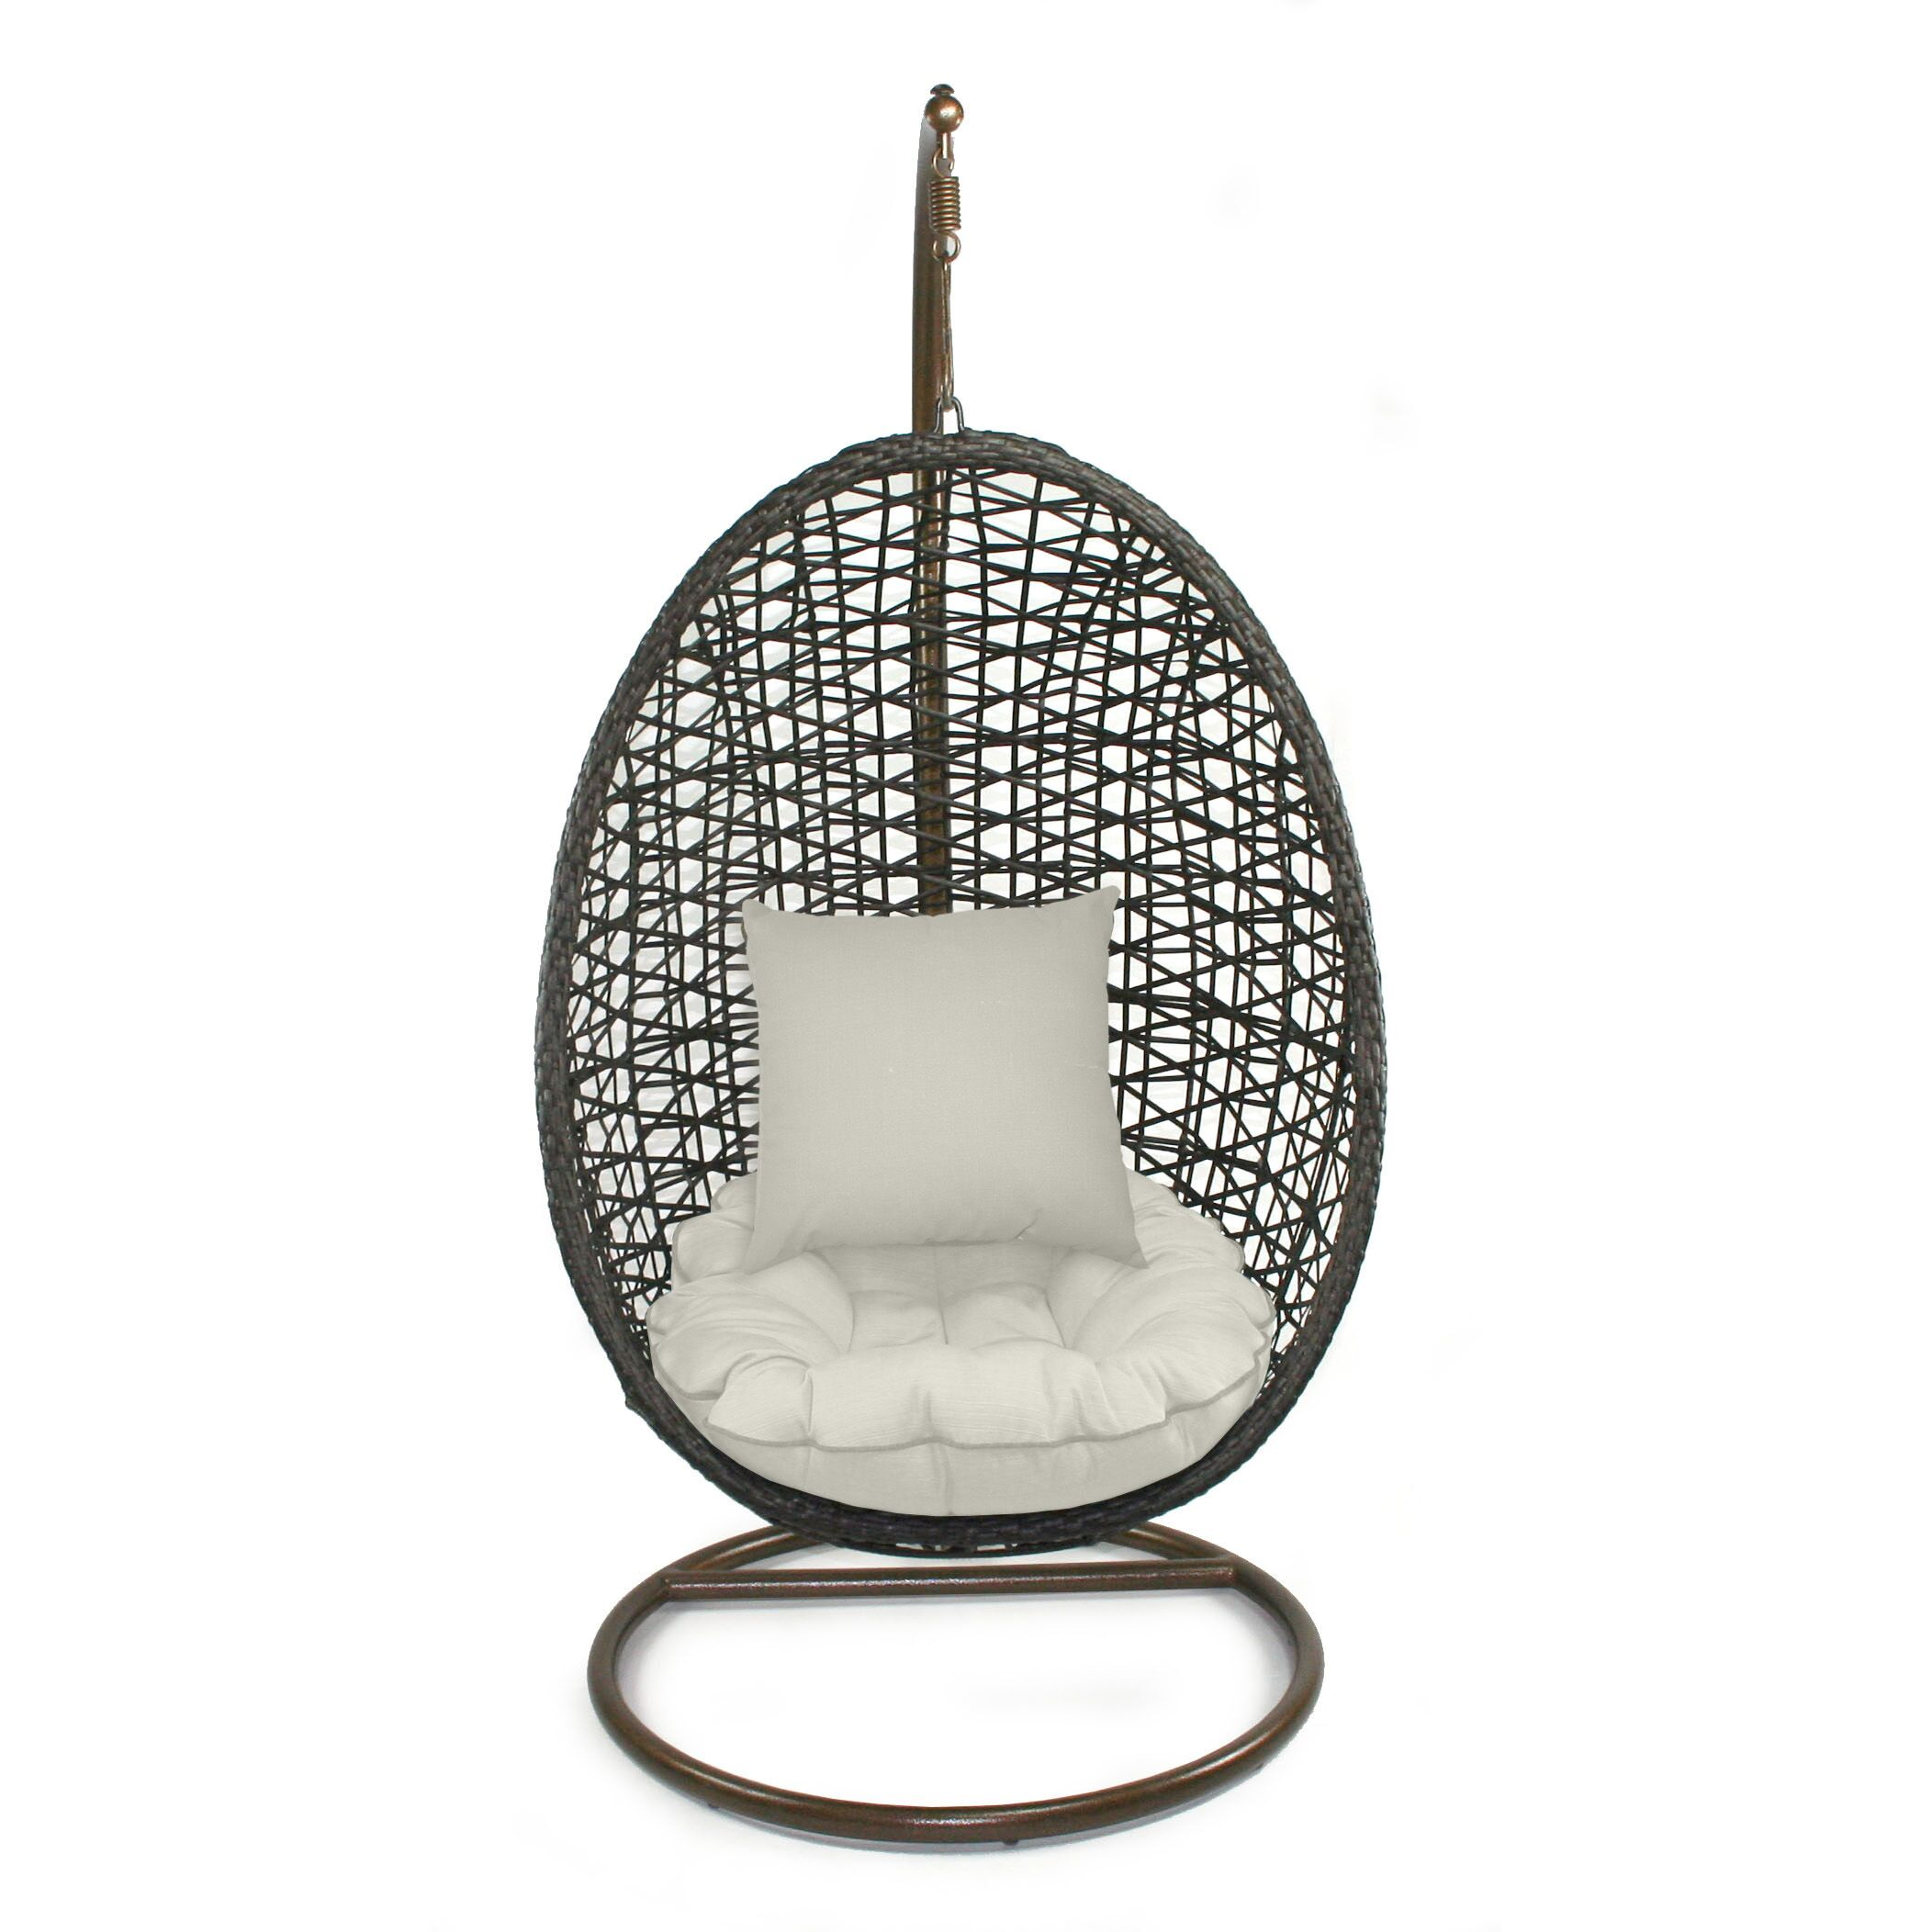 Skye Bird's Nest Swing Chair with Stand Fabric: Eggshell